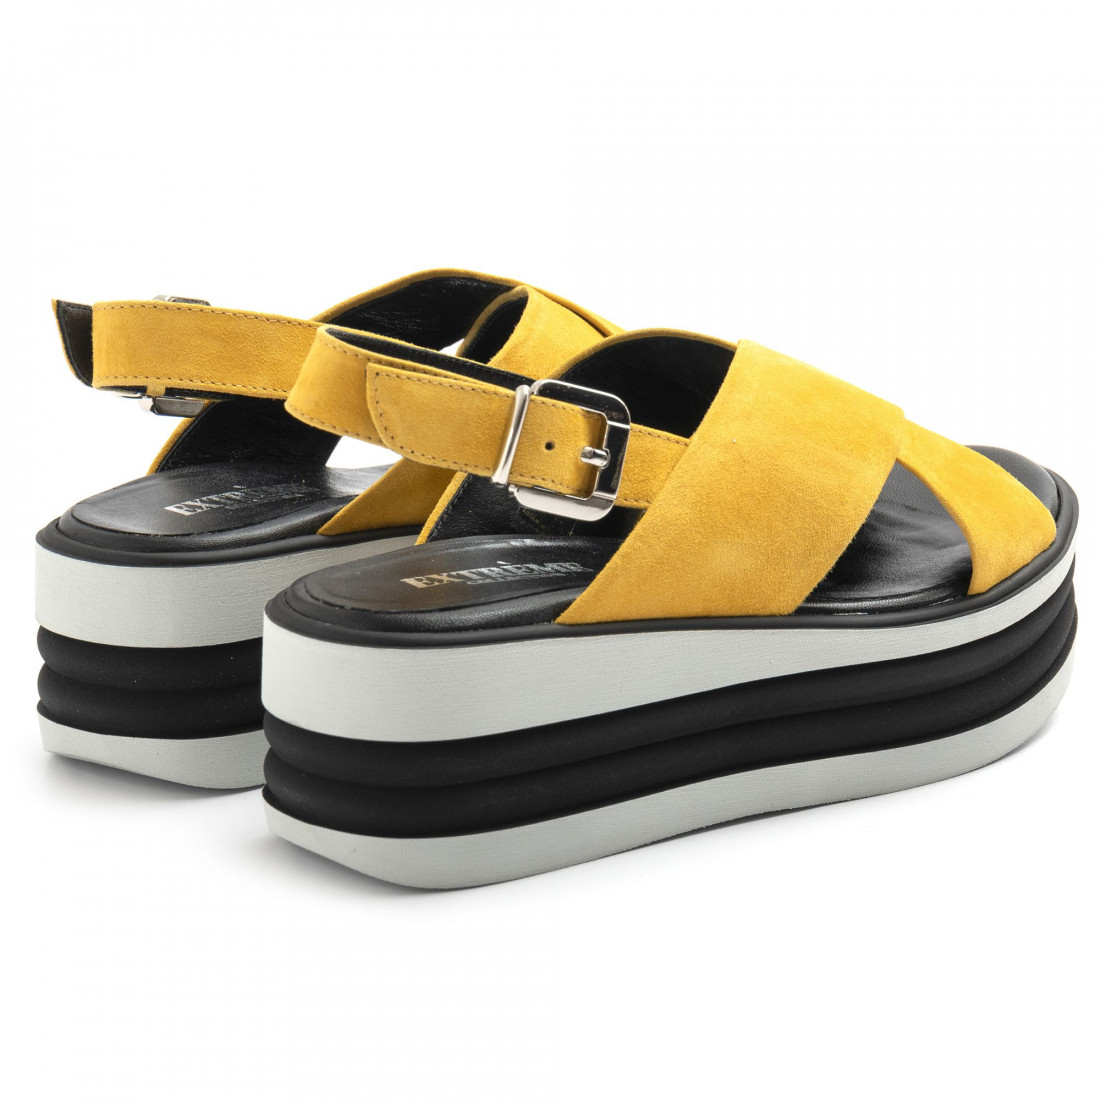 sandals woman extreme 2801foxcamoscio ocra 8579